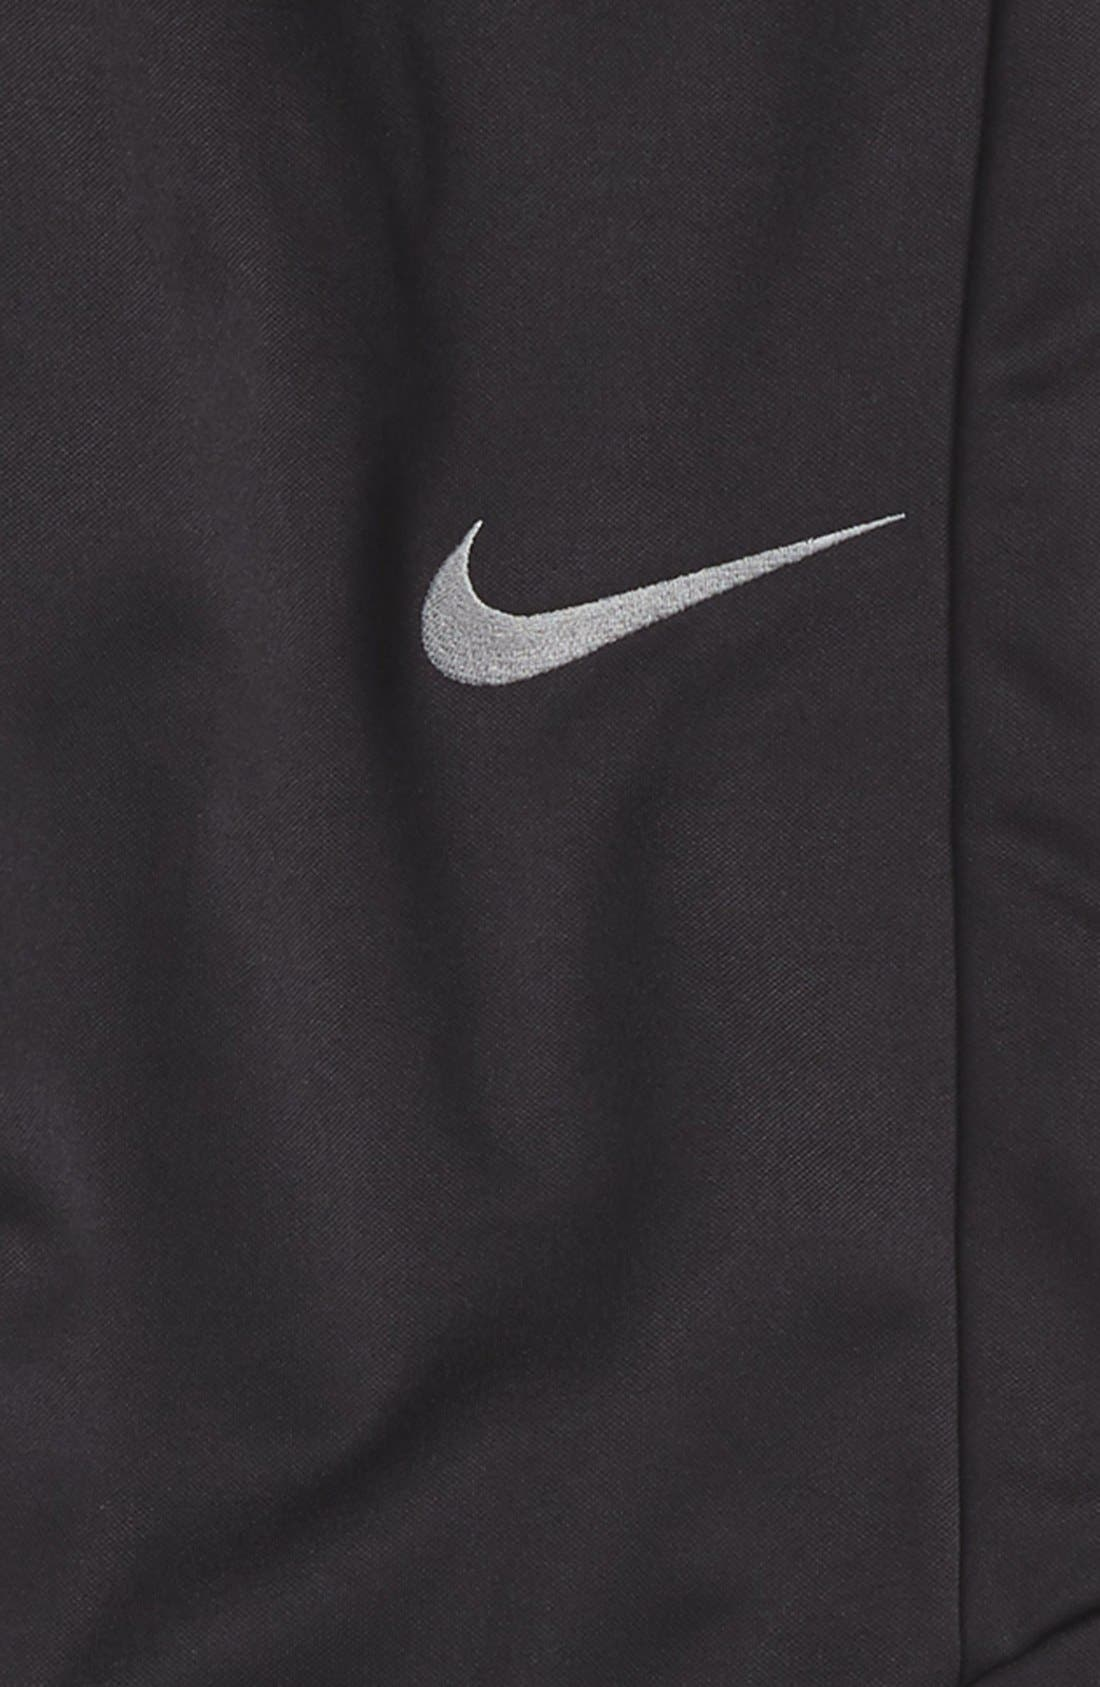 Therma-FIT Tapered Fleece Pants,                             Alternate thumbnail 2, color,                             Black/ Dark Steel Grey